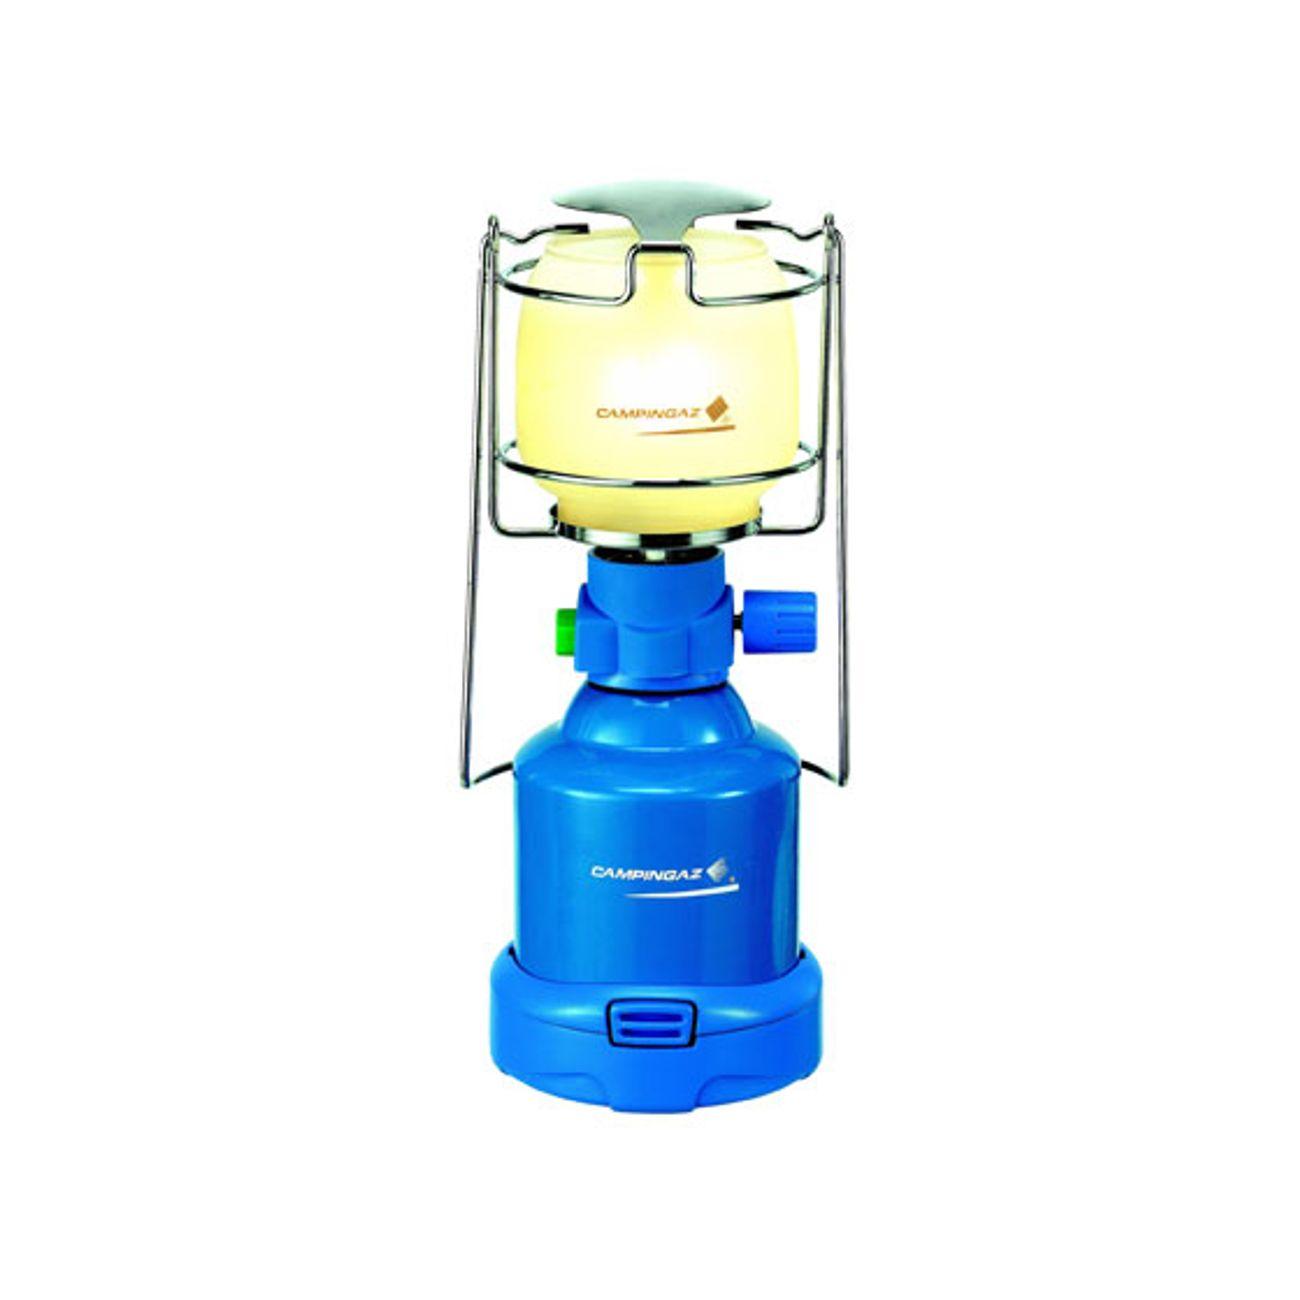 Lanterne lampe gaz lumo c206 80w achat et prix pas - Lampe camping gaz ...